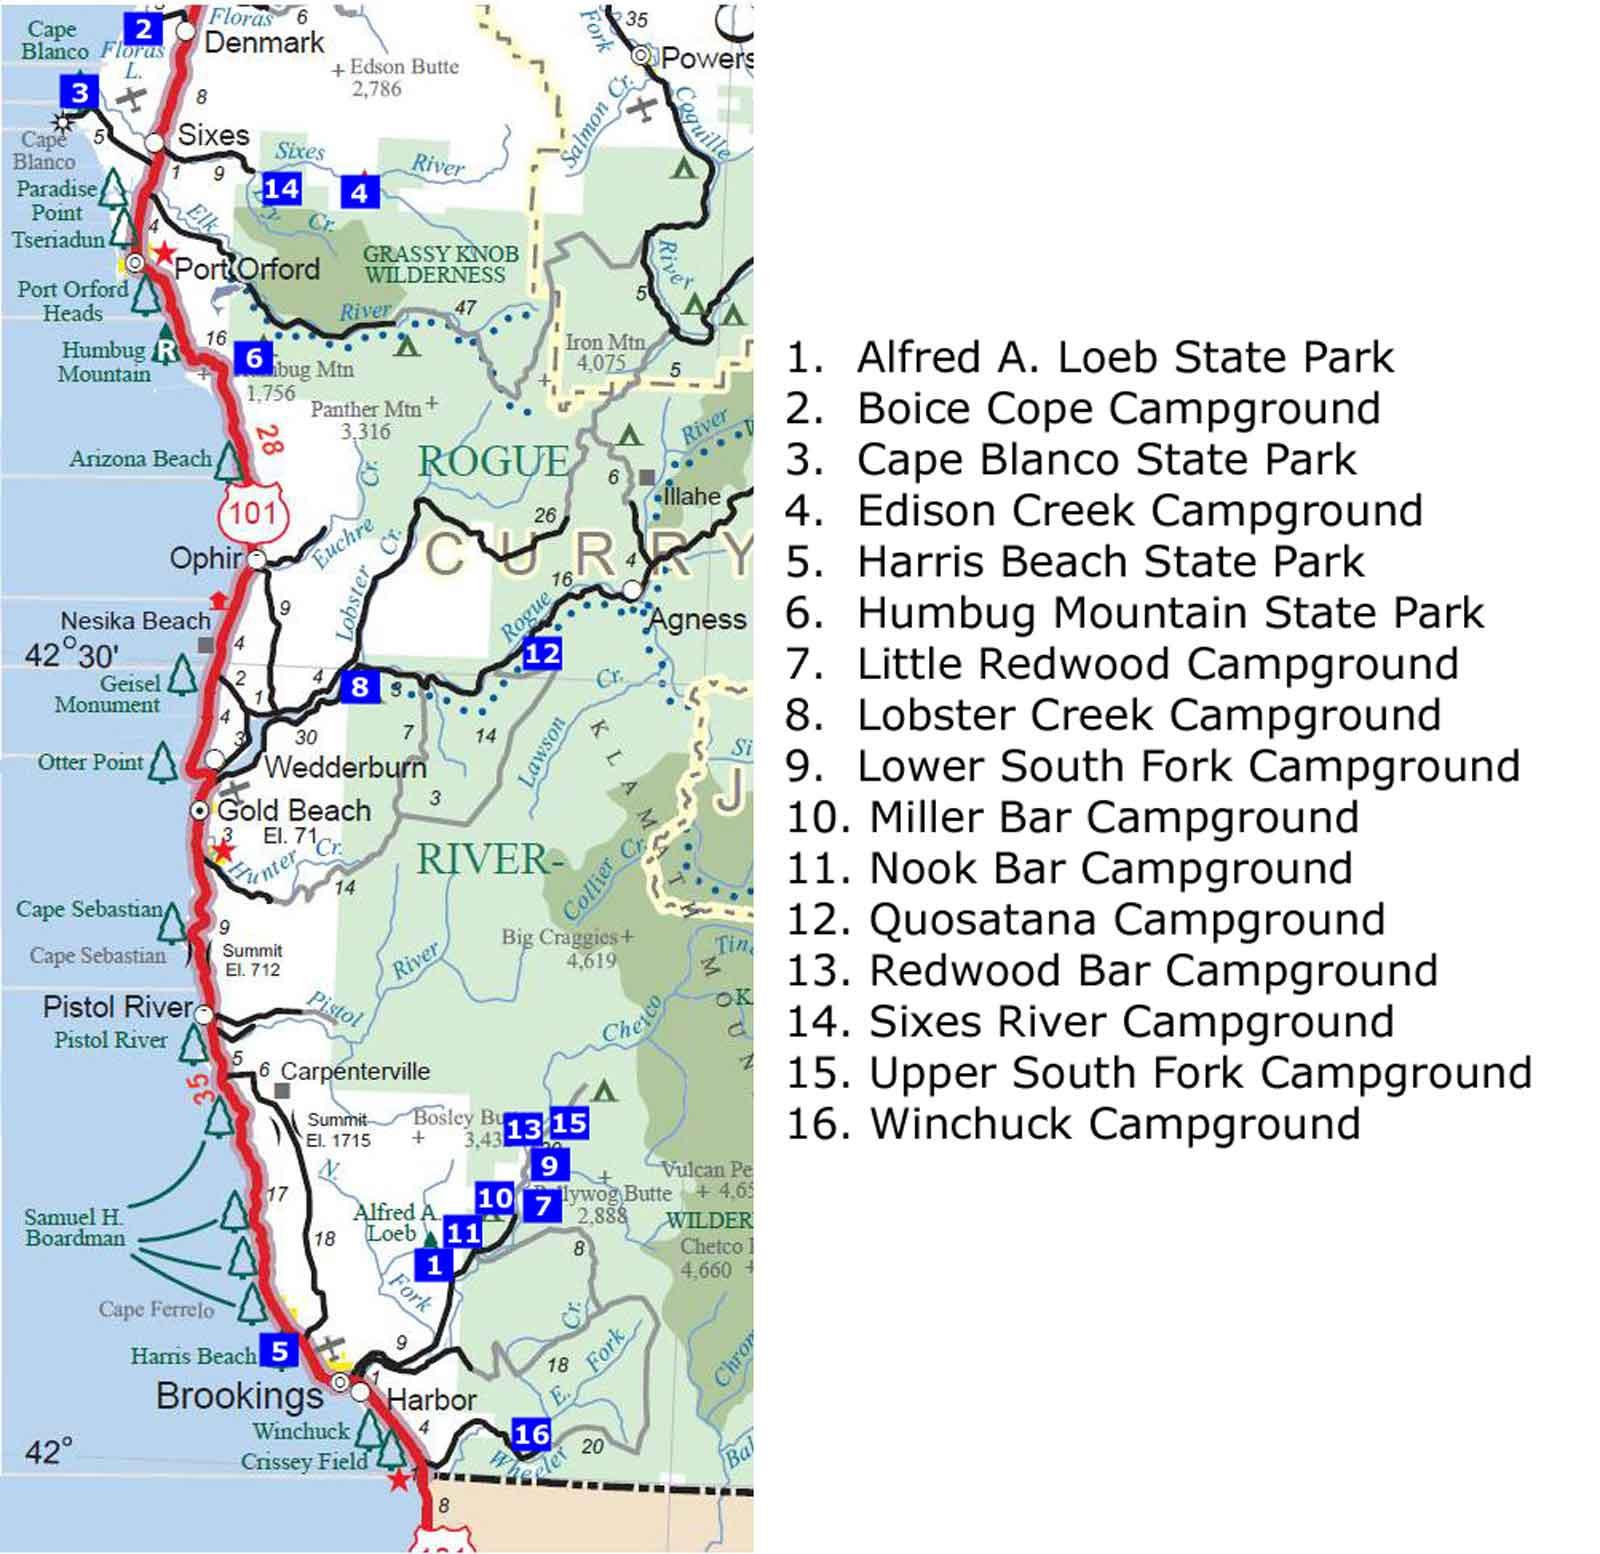 Southern California Edison Map Fresh Map Oregon And California Coast - Oregon California Coast Map